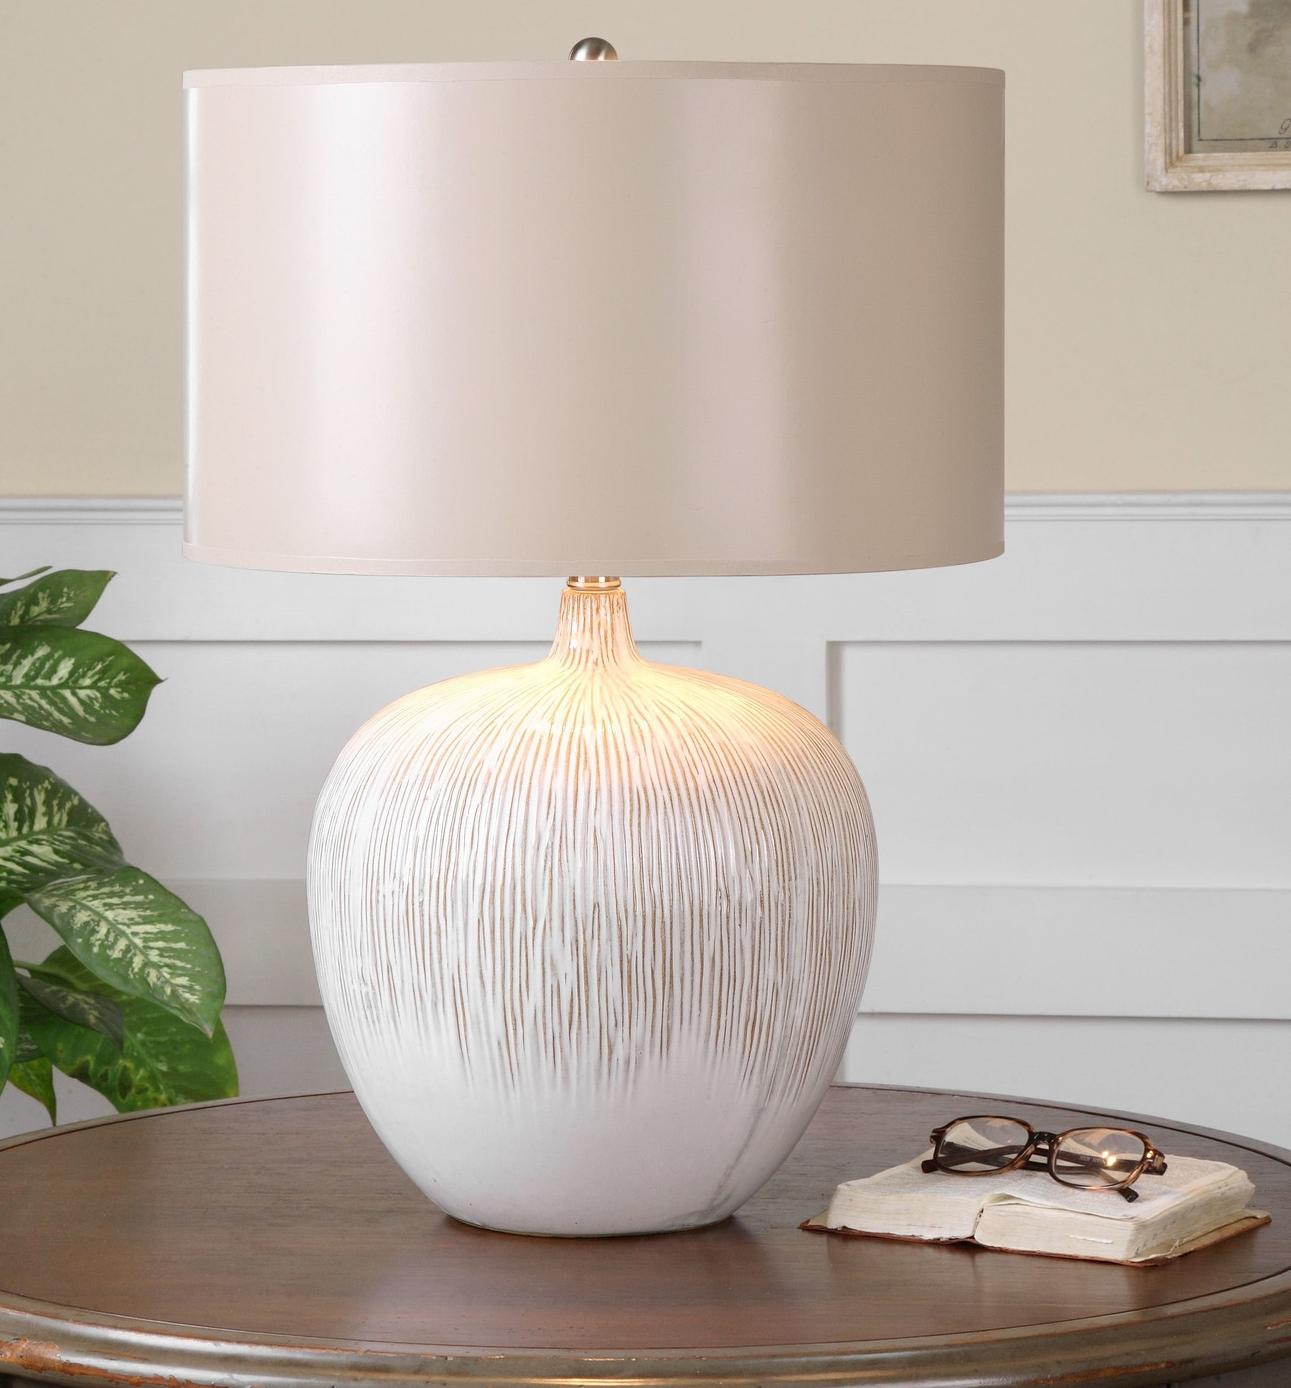 Georgios+Table+Lamp.jpg